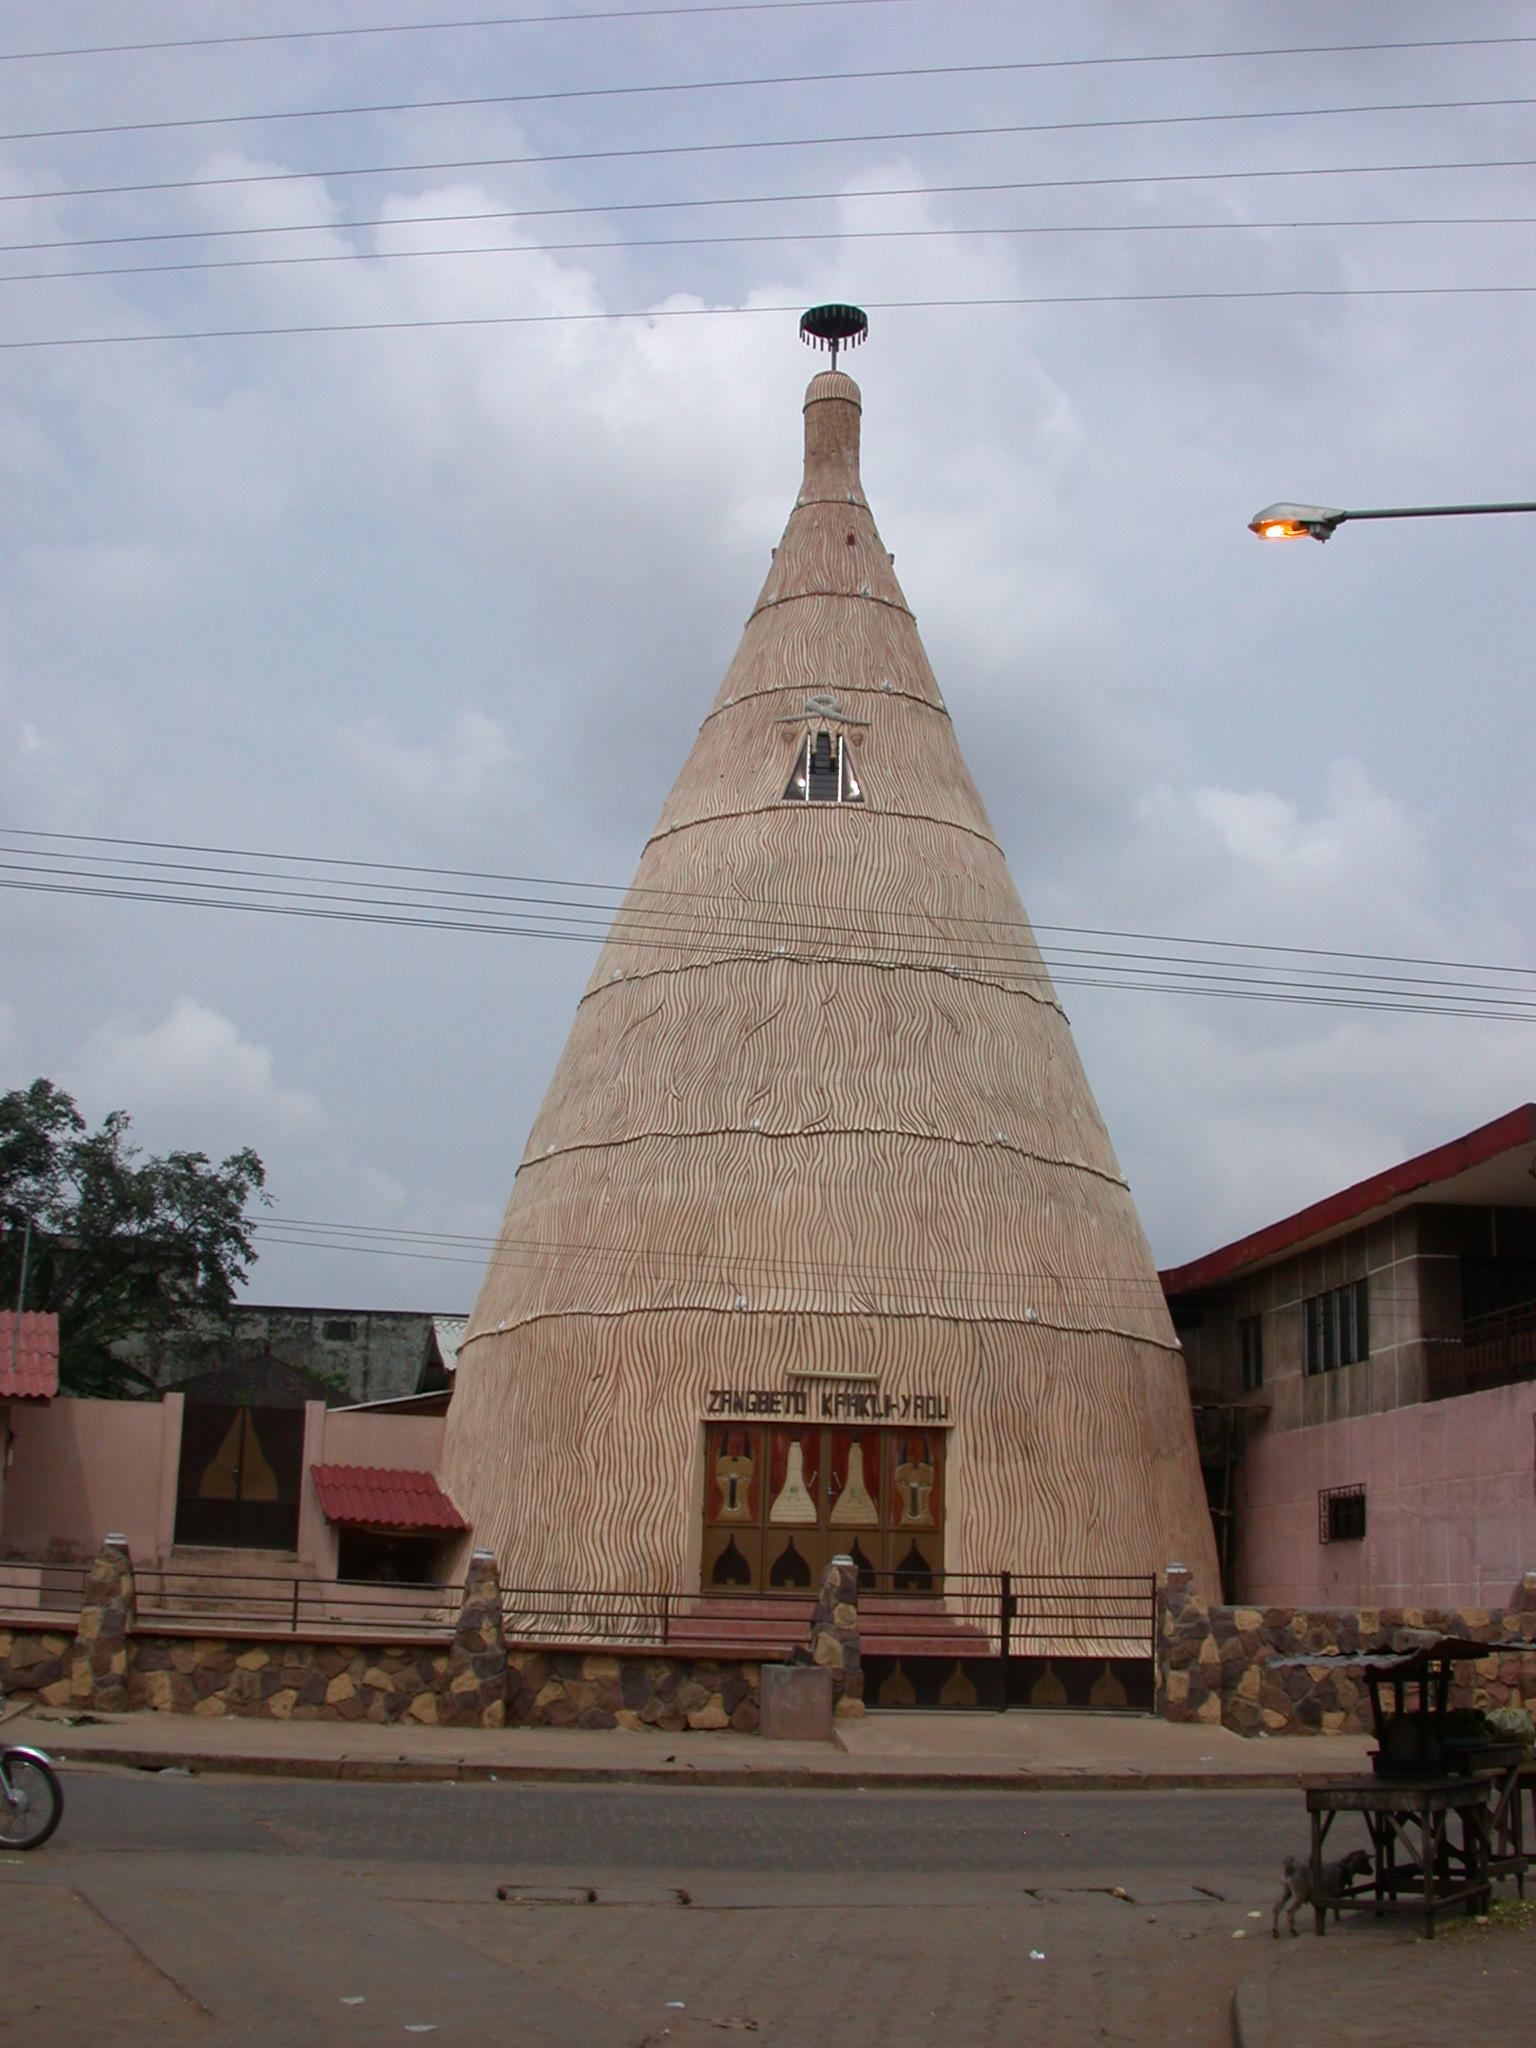 Zangbeto Kphkli-Yaou Temple, Porto Novo, Benin